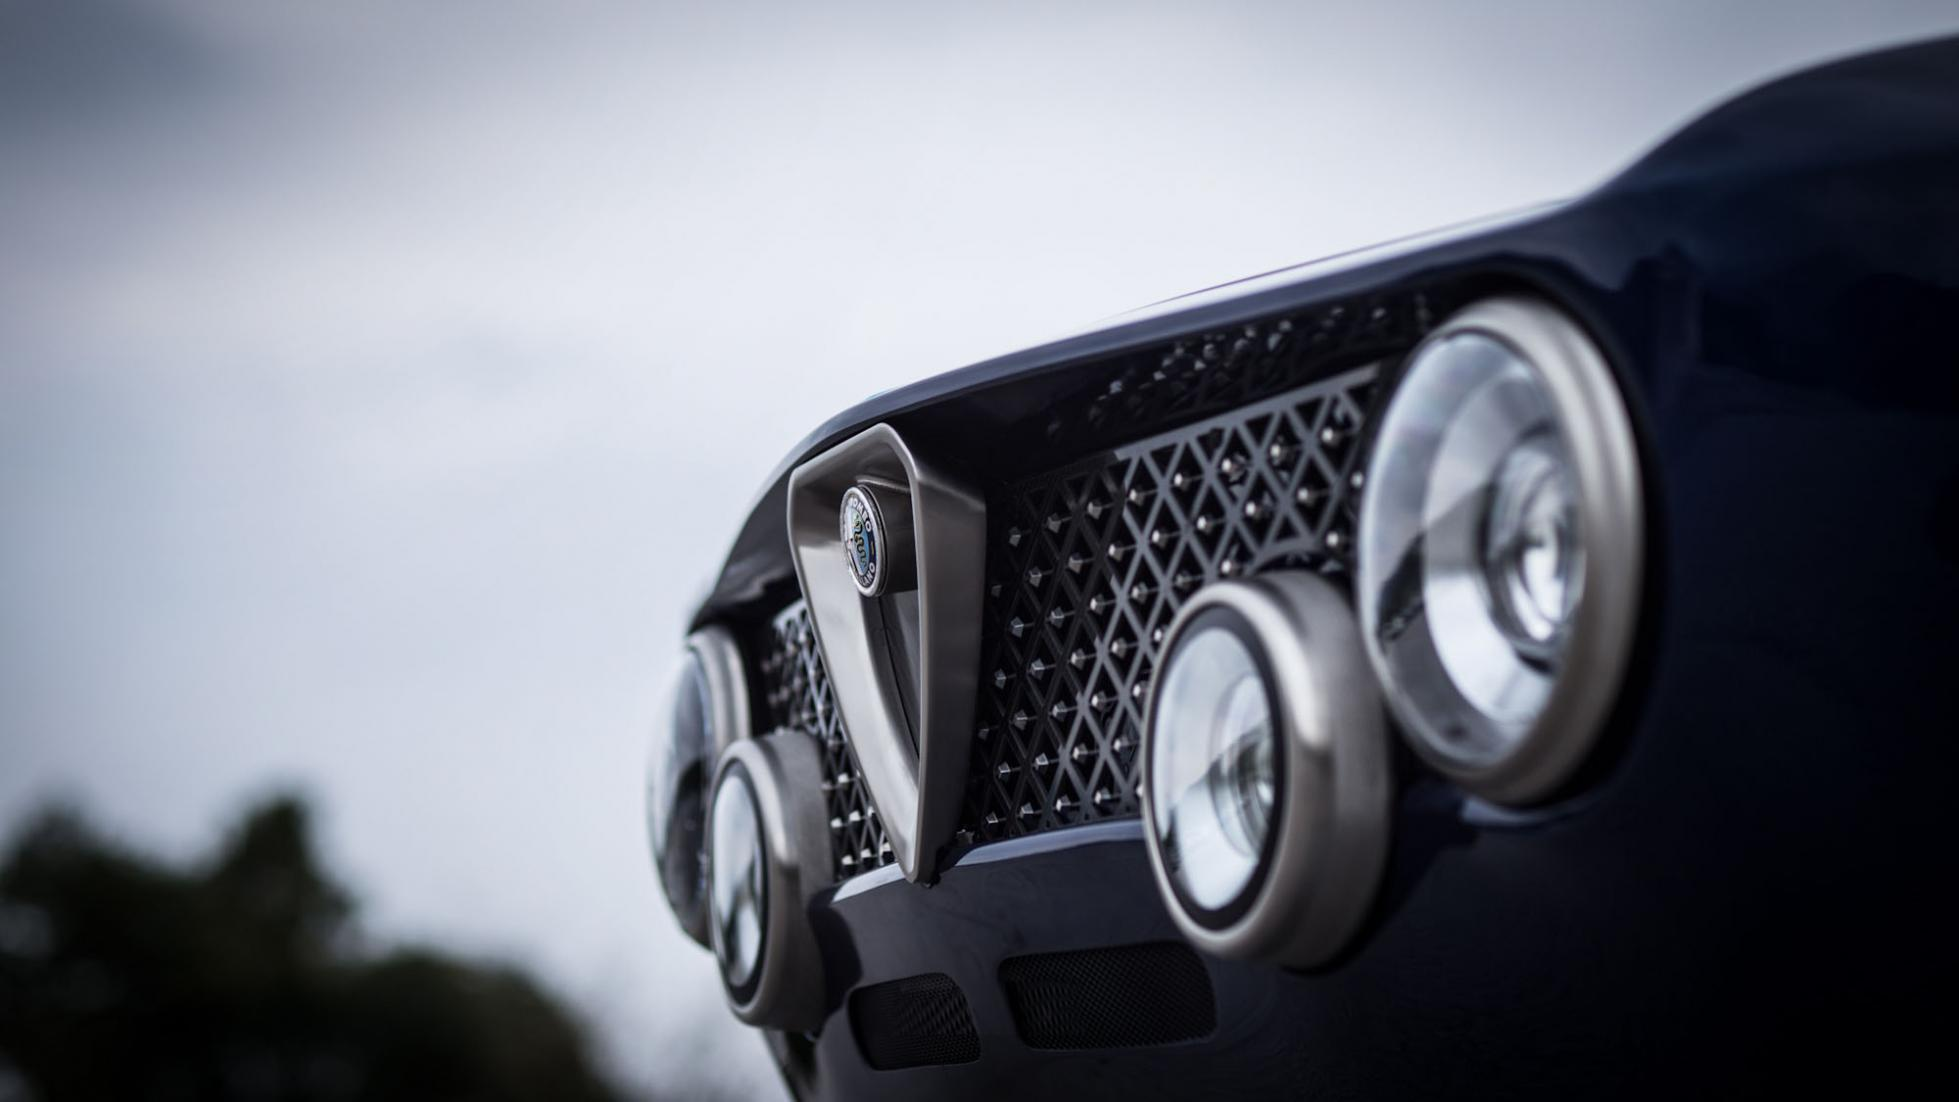 Alfa-Romeo-Giulia-GT-Electric-by-Totem-Automobili-4